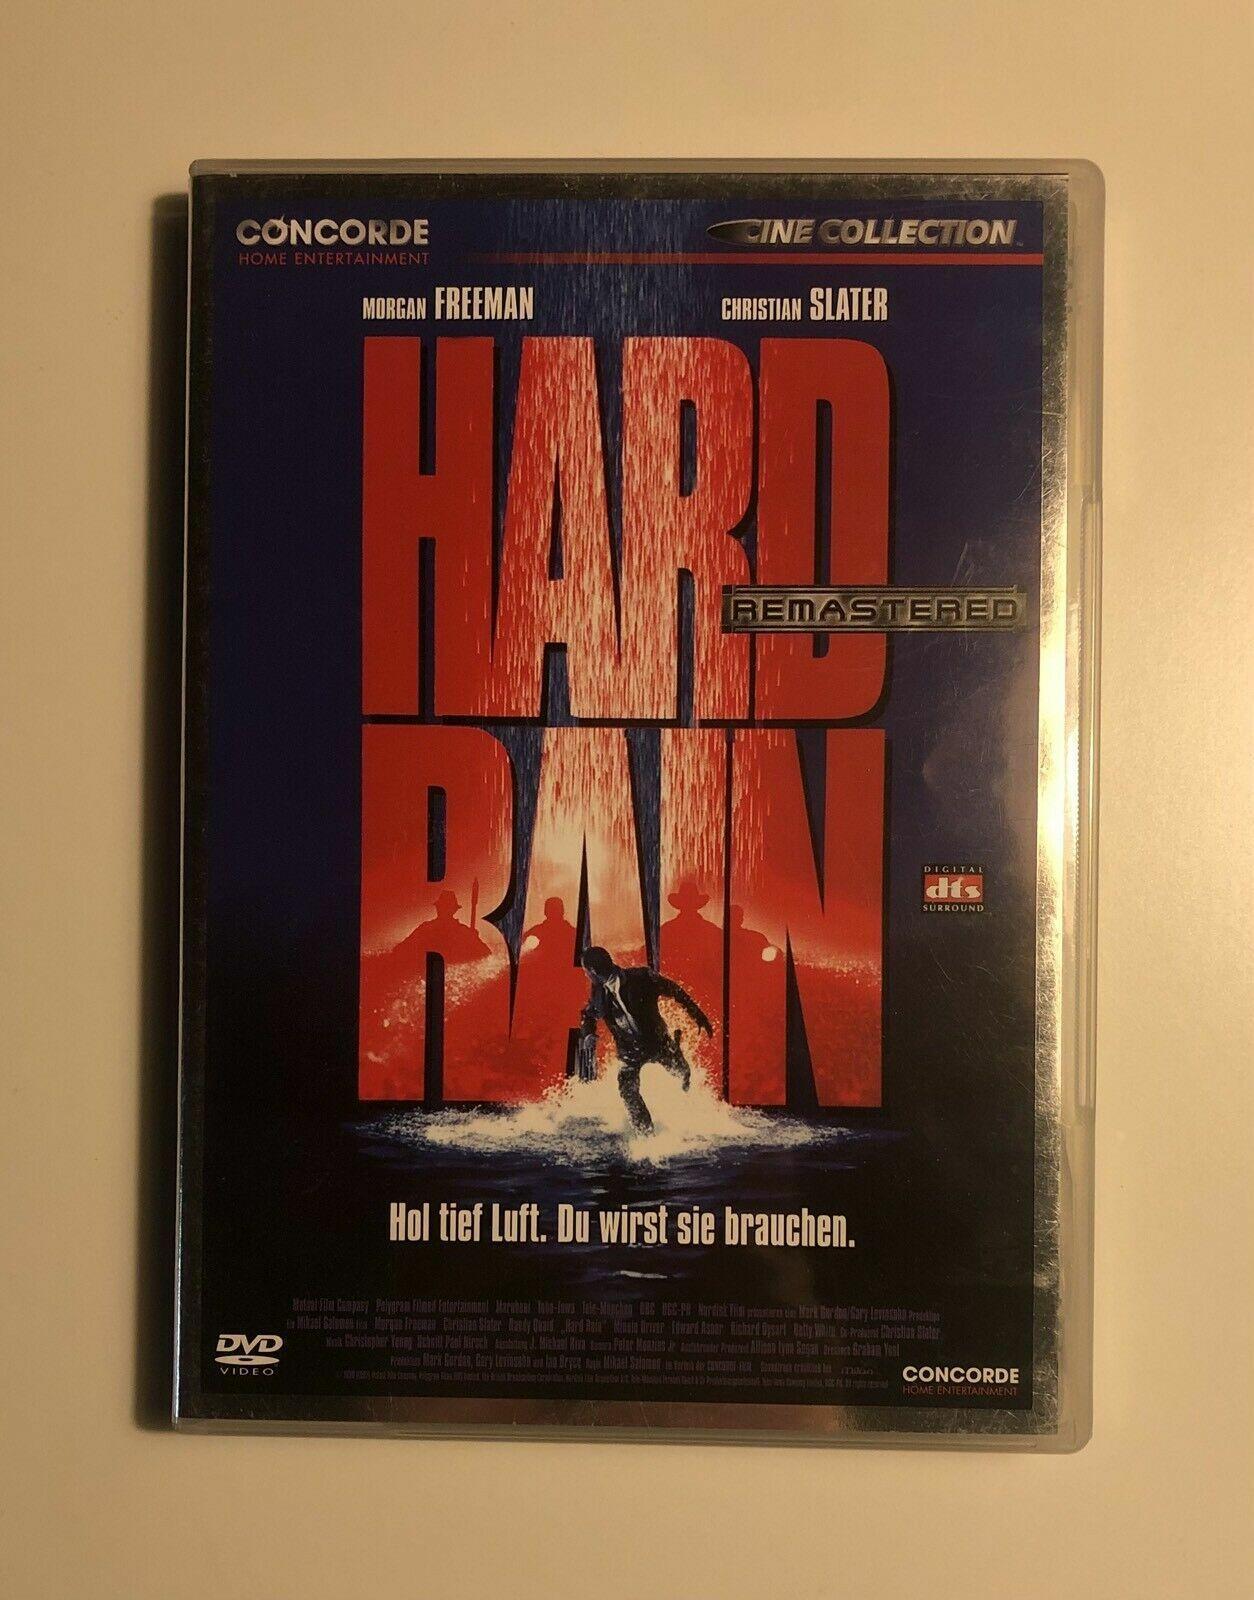 HARD RAIN DVD Christian Slater Morgan Freeman Top Film